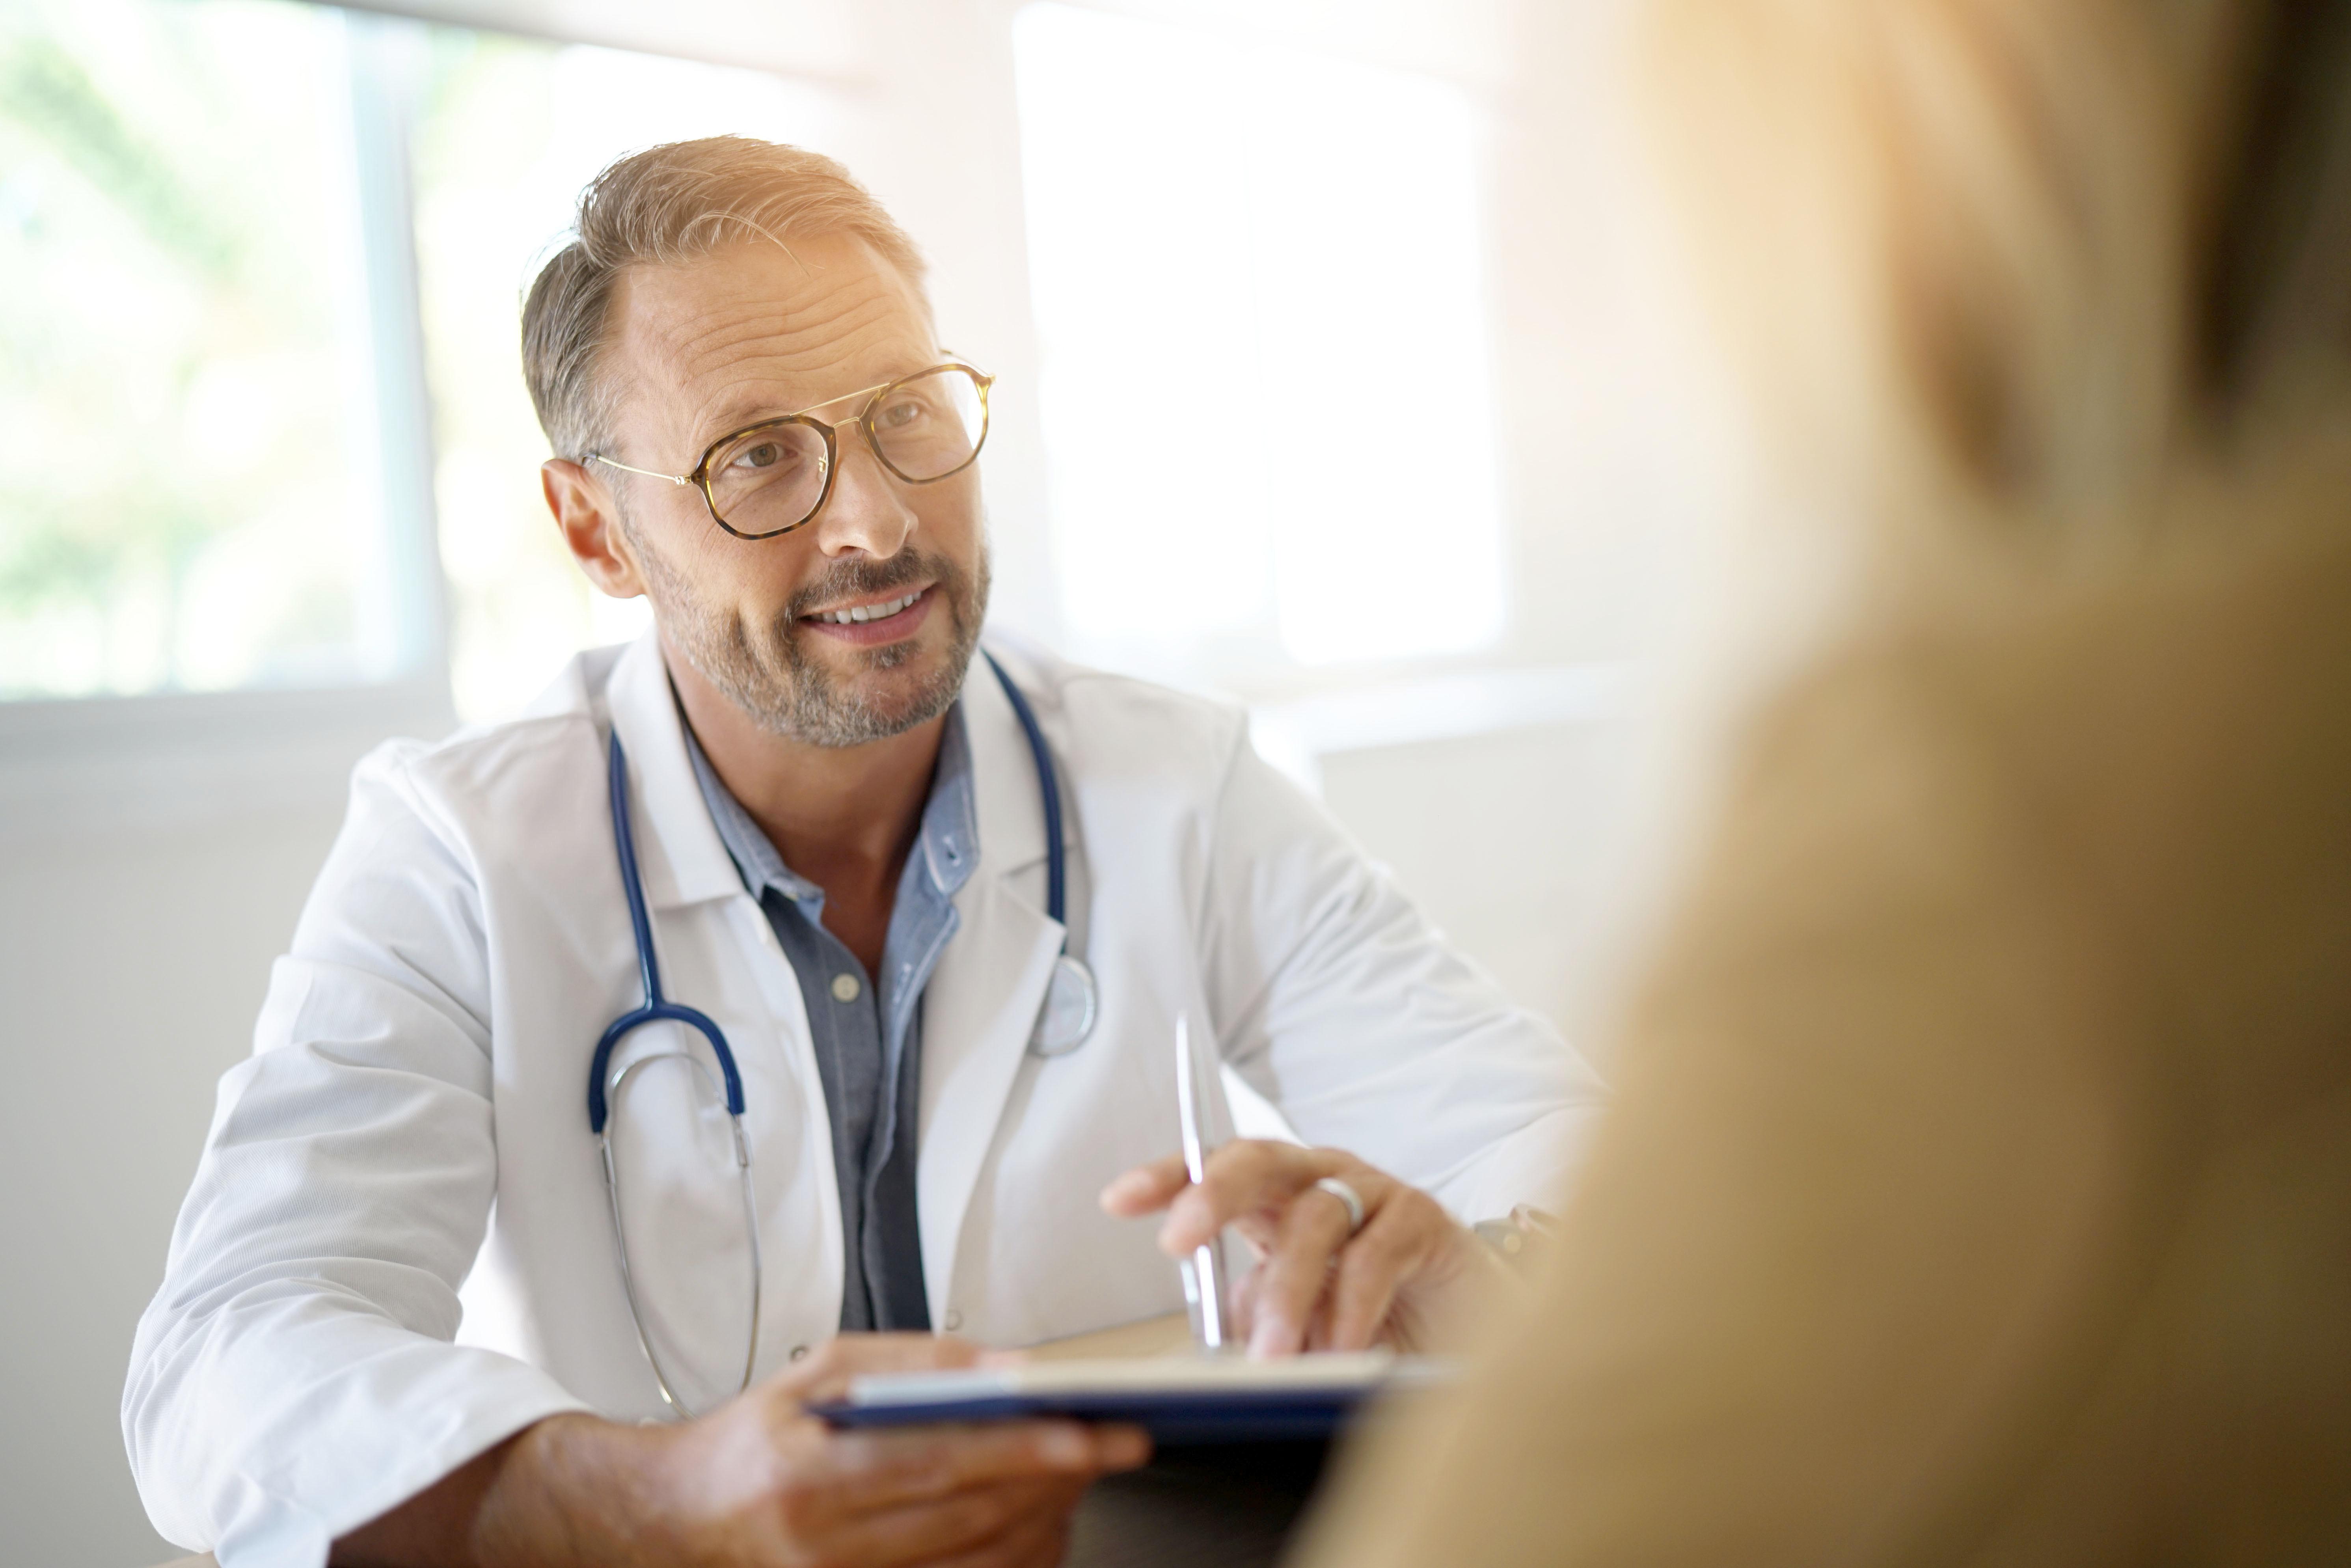 Find the Best EHR With This Checklist